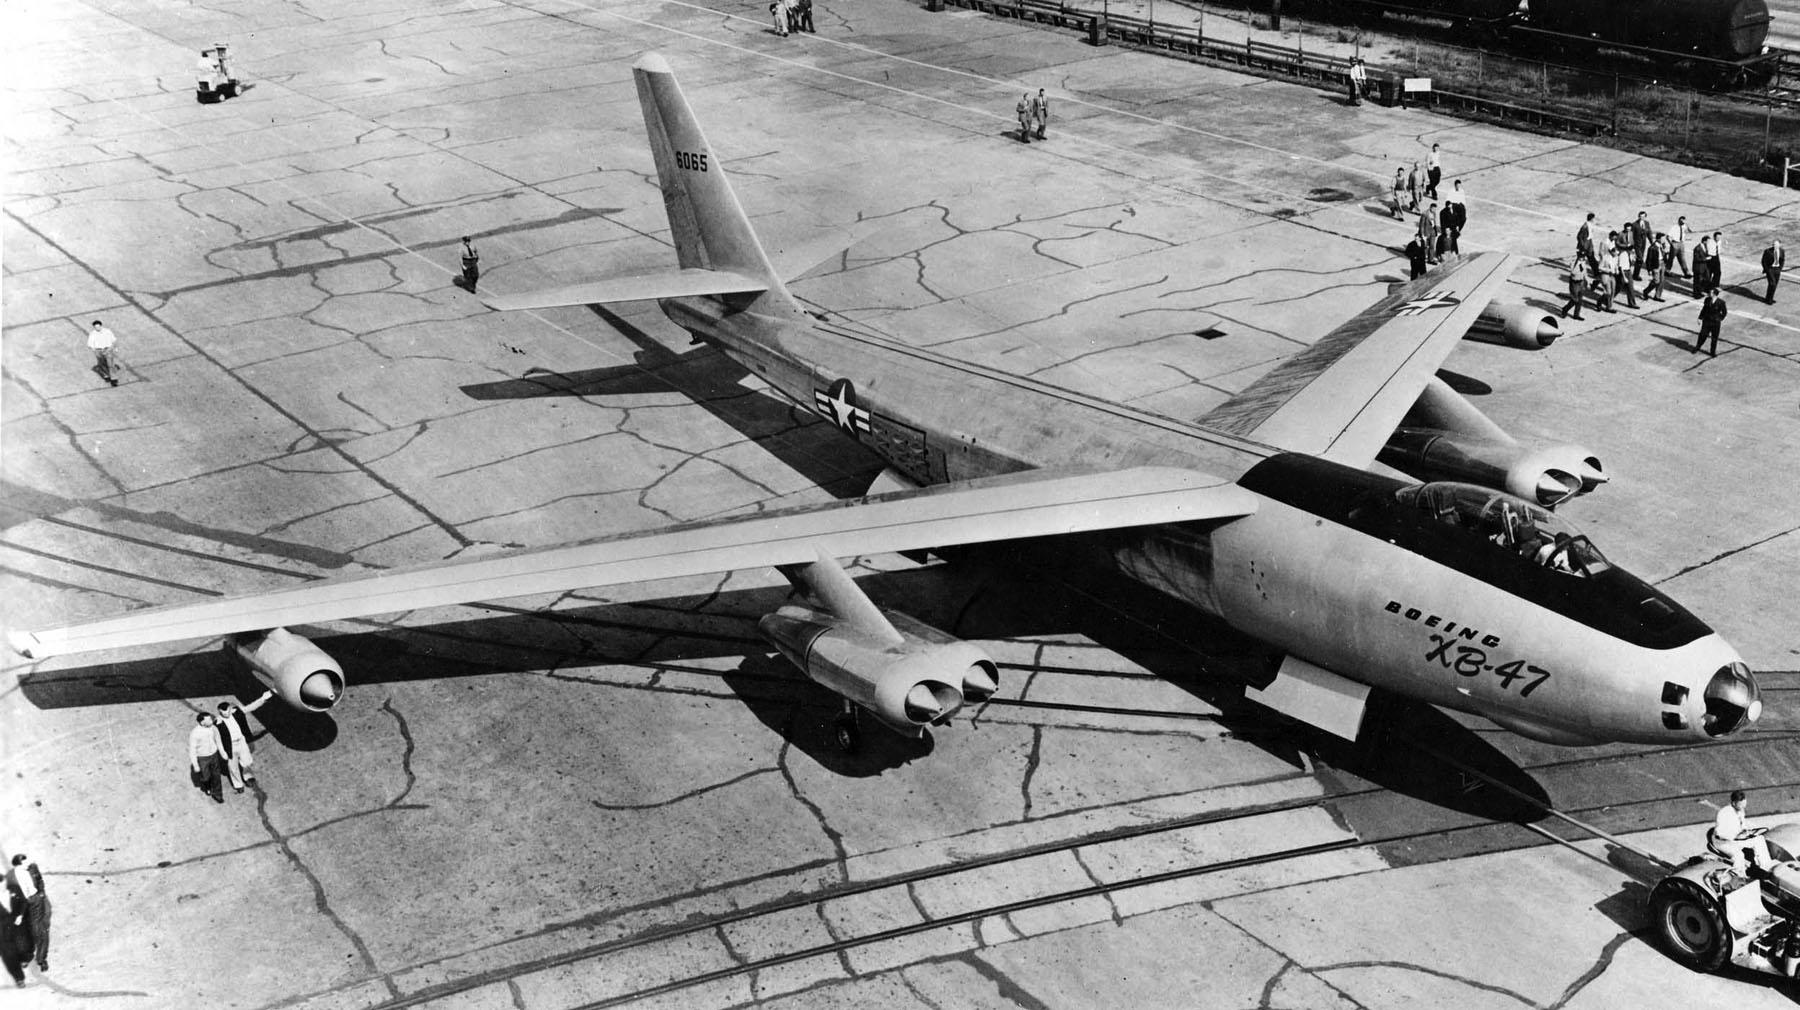 Boeing XB-47